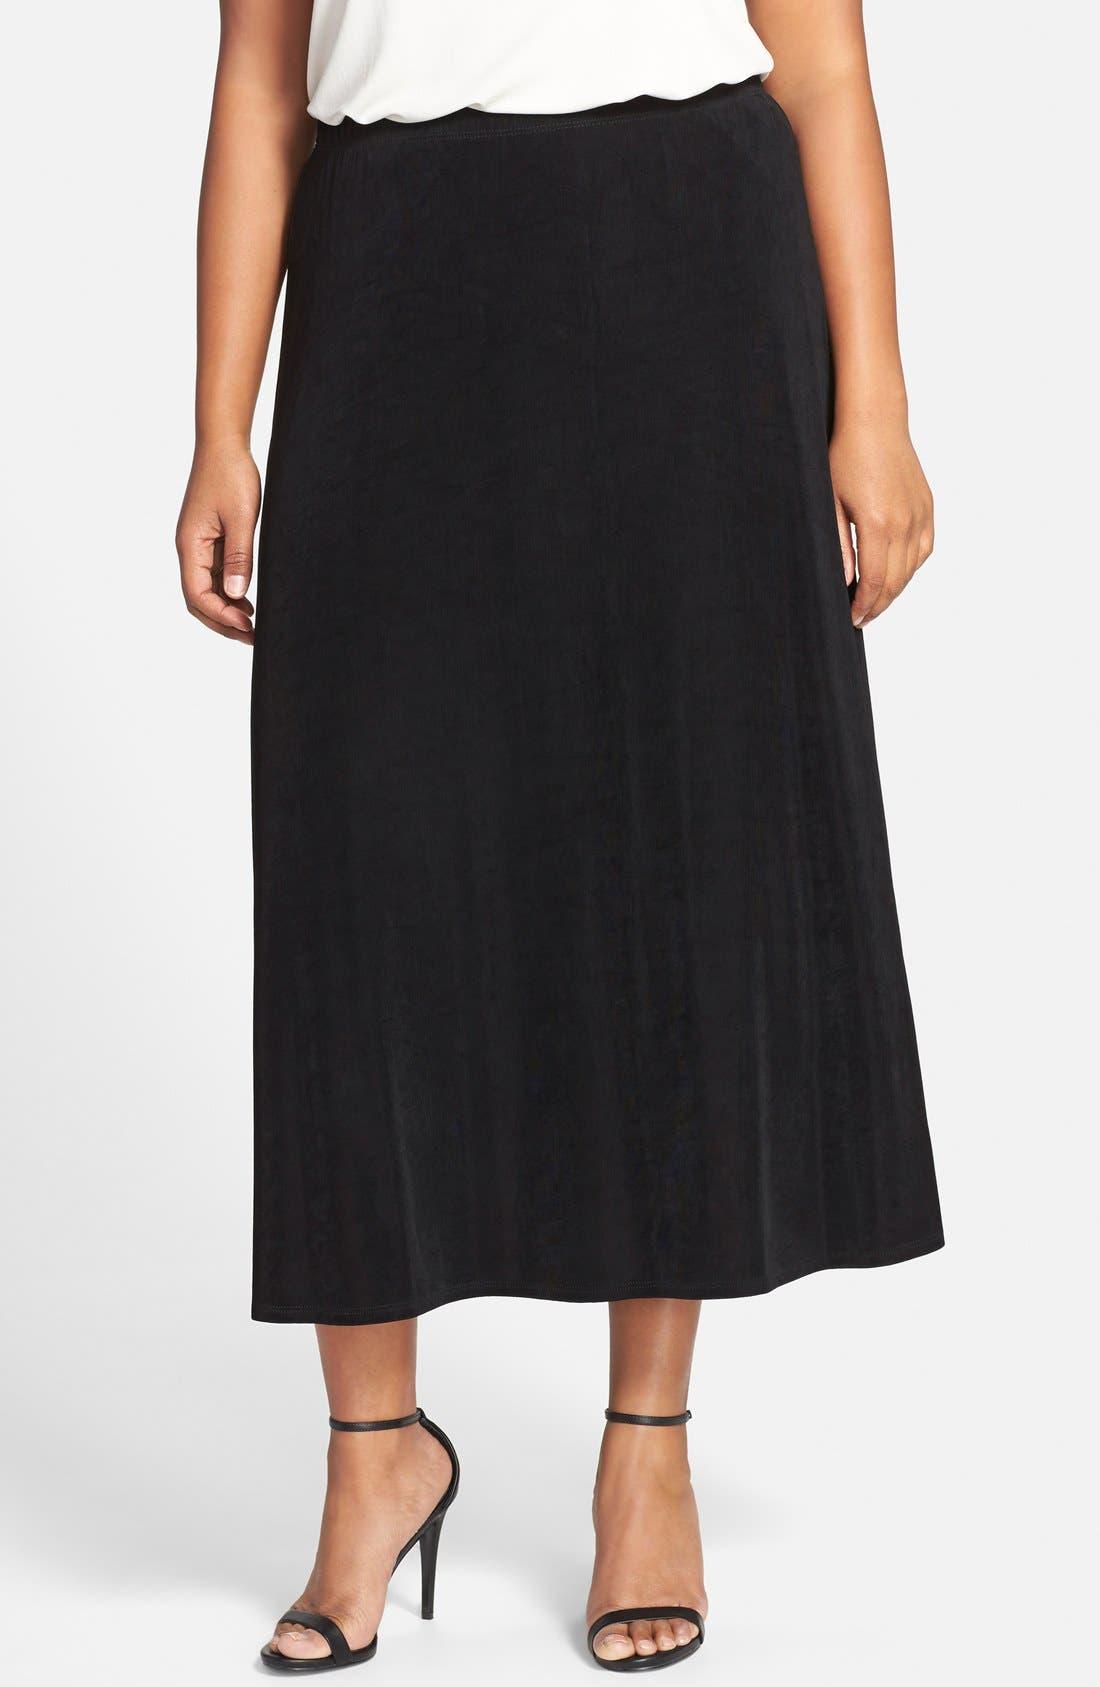 Alternate Image 1 Selected - Vikki Vi Long A-Line Skirt (Plus Size)